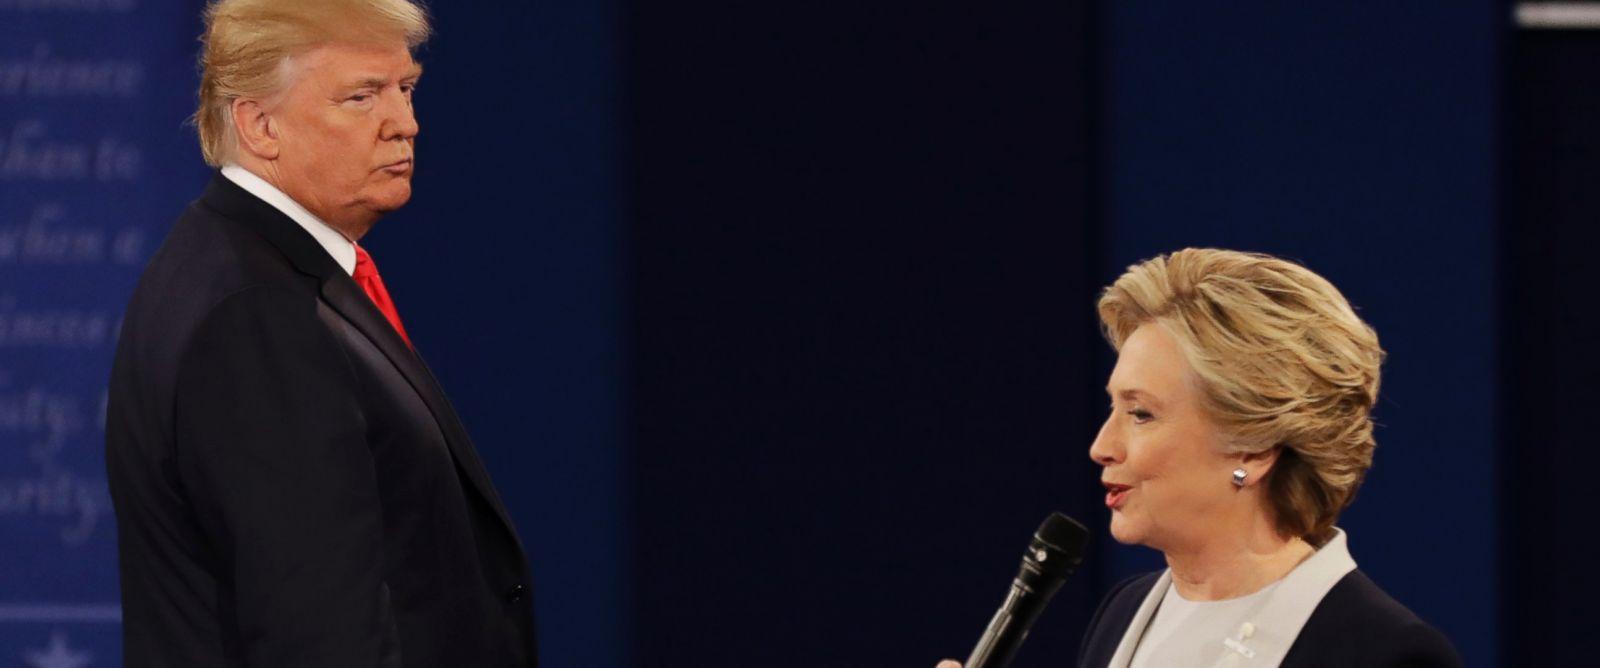 news nationworld politics trump clinton debates story